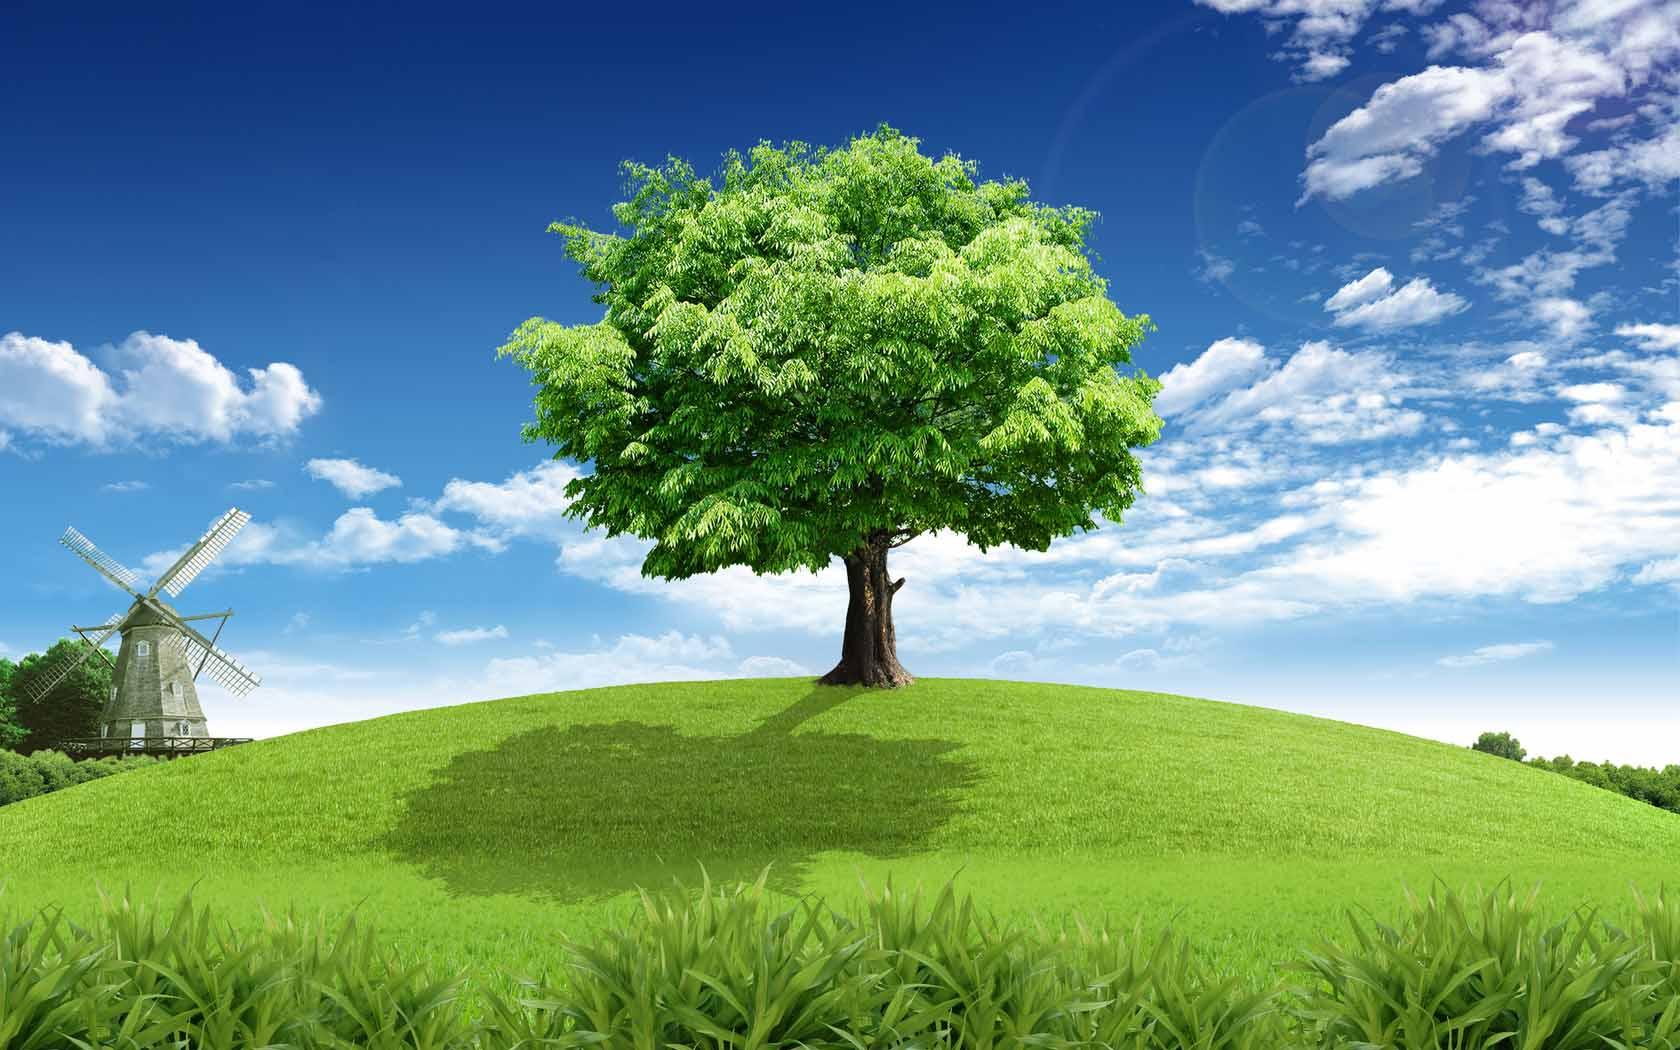 MX-33 Beautiful Tree Wallpaper, Tree Adorable Desktop Wallpapers